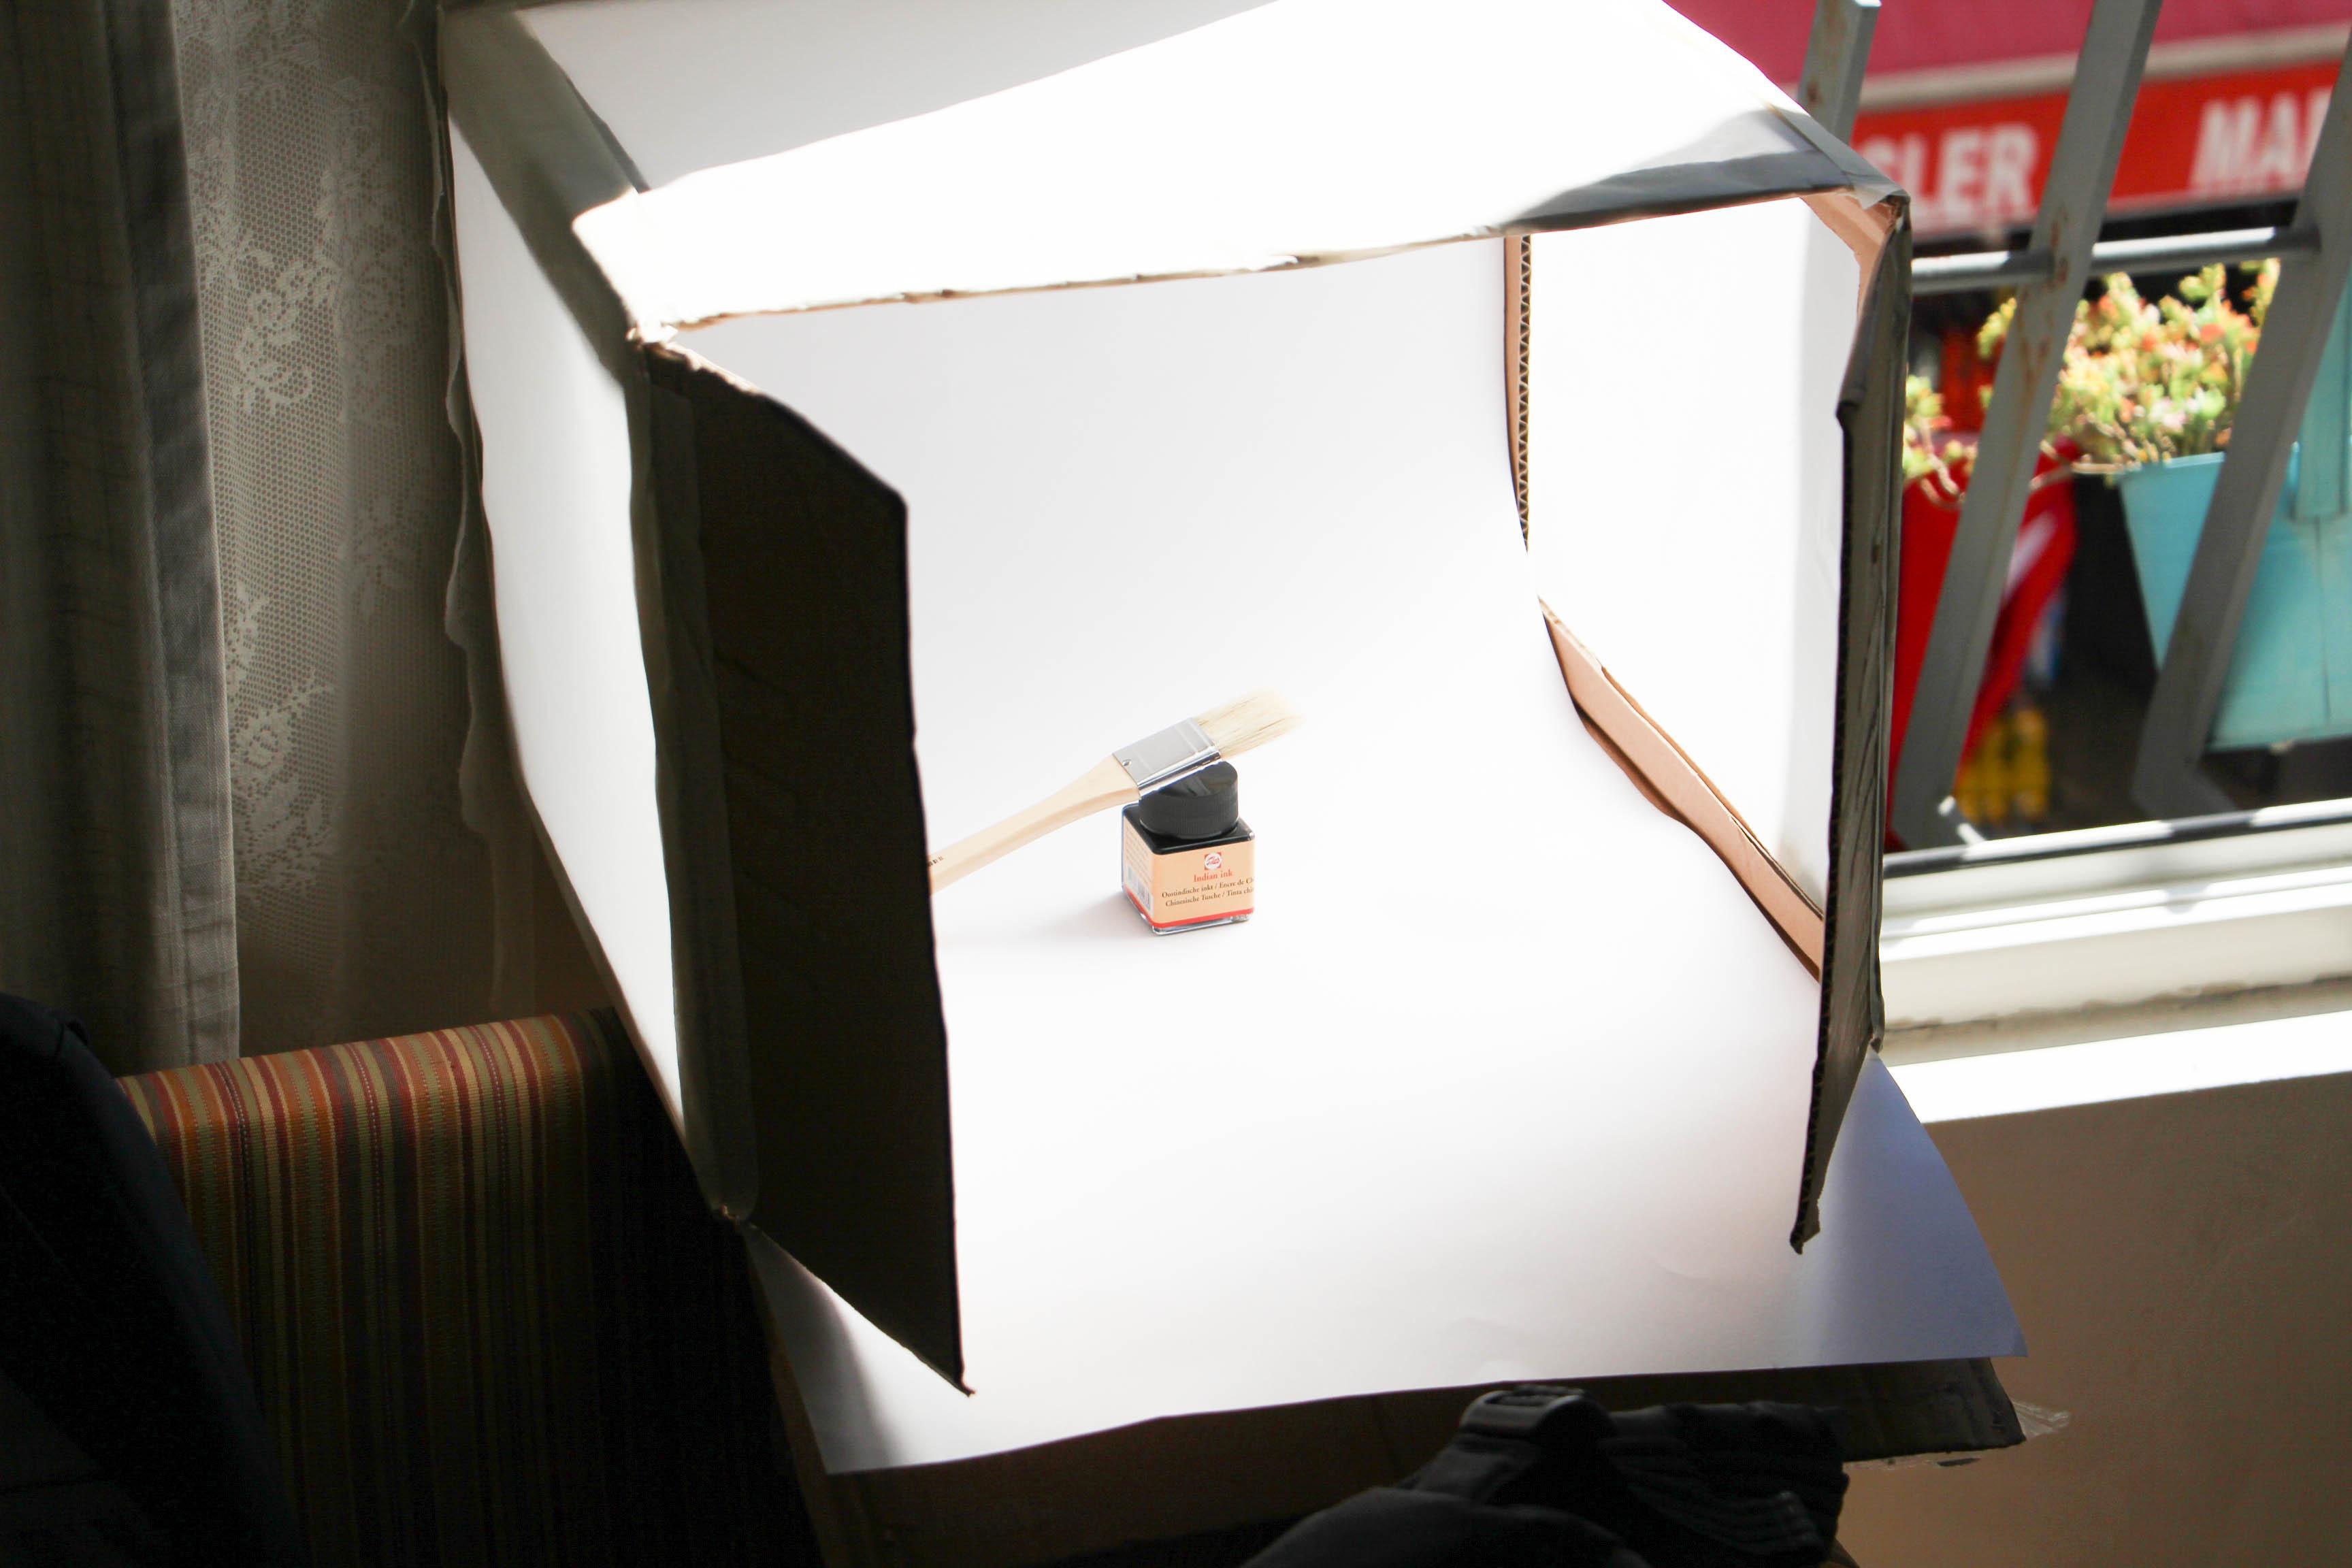 lighting spectrum photography product box light full britten cover brittenled britefinity series led lightbox frame